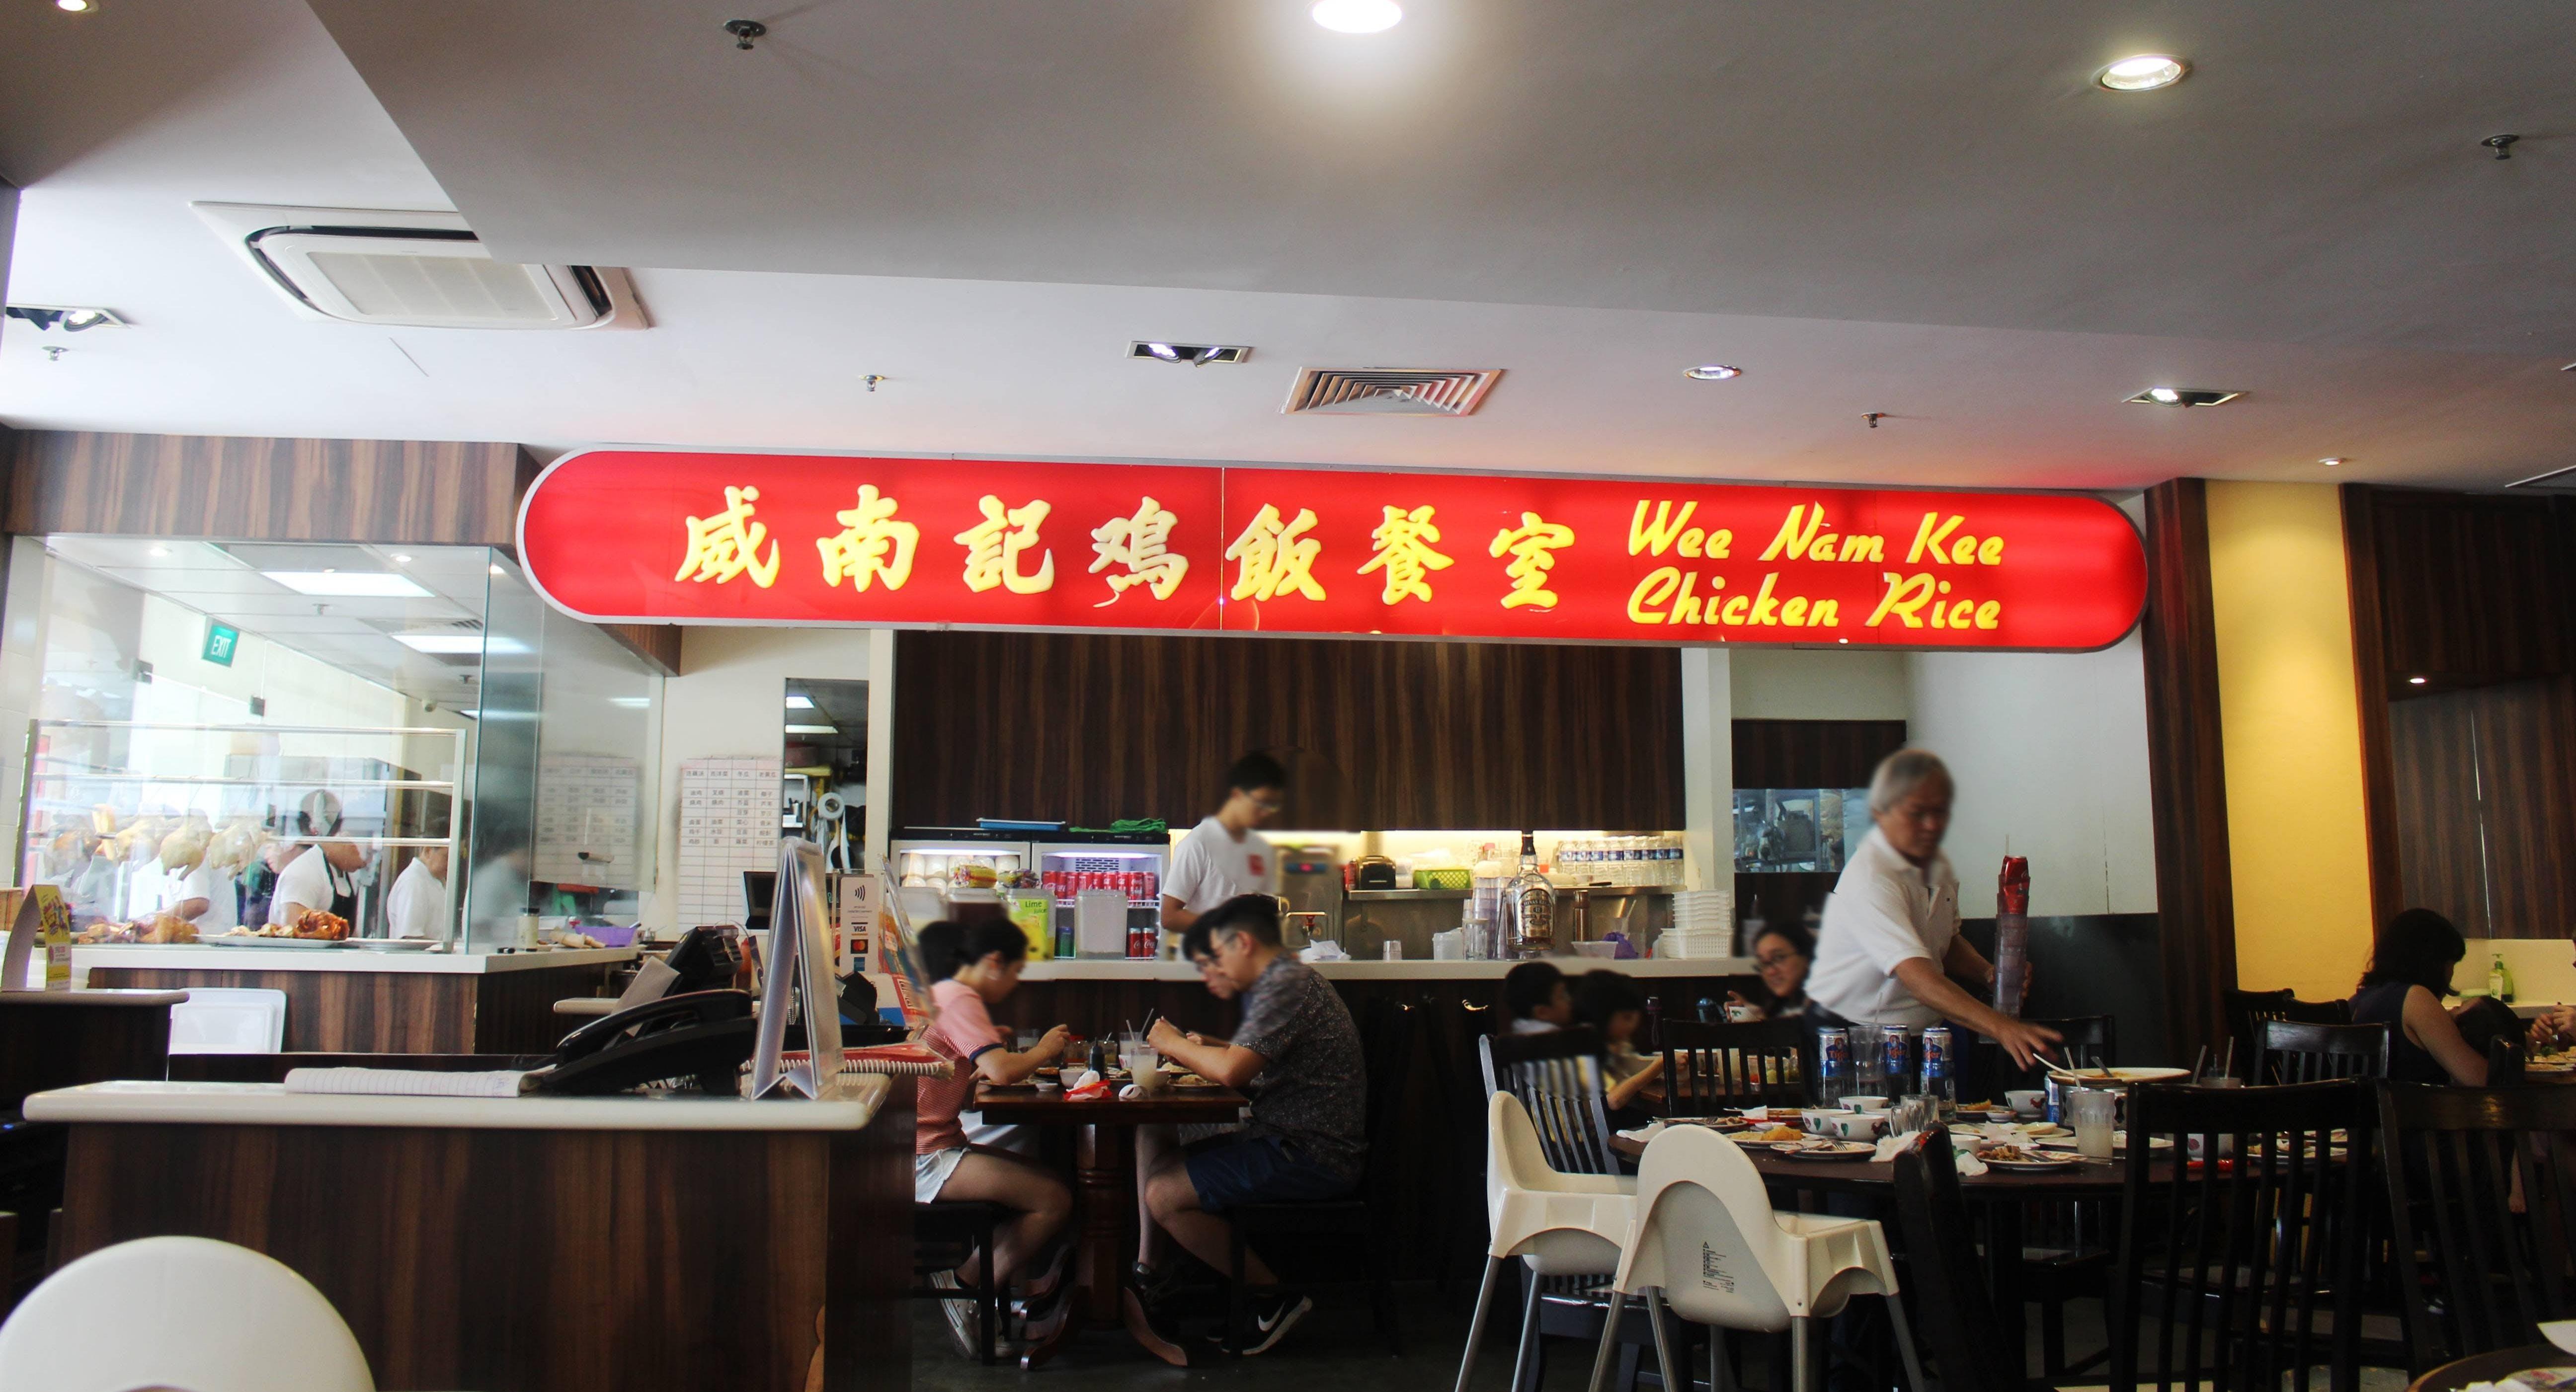 Wee Nam Kee Hainanese Chicken